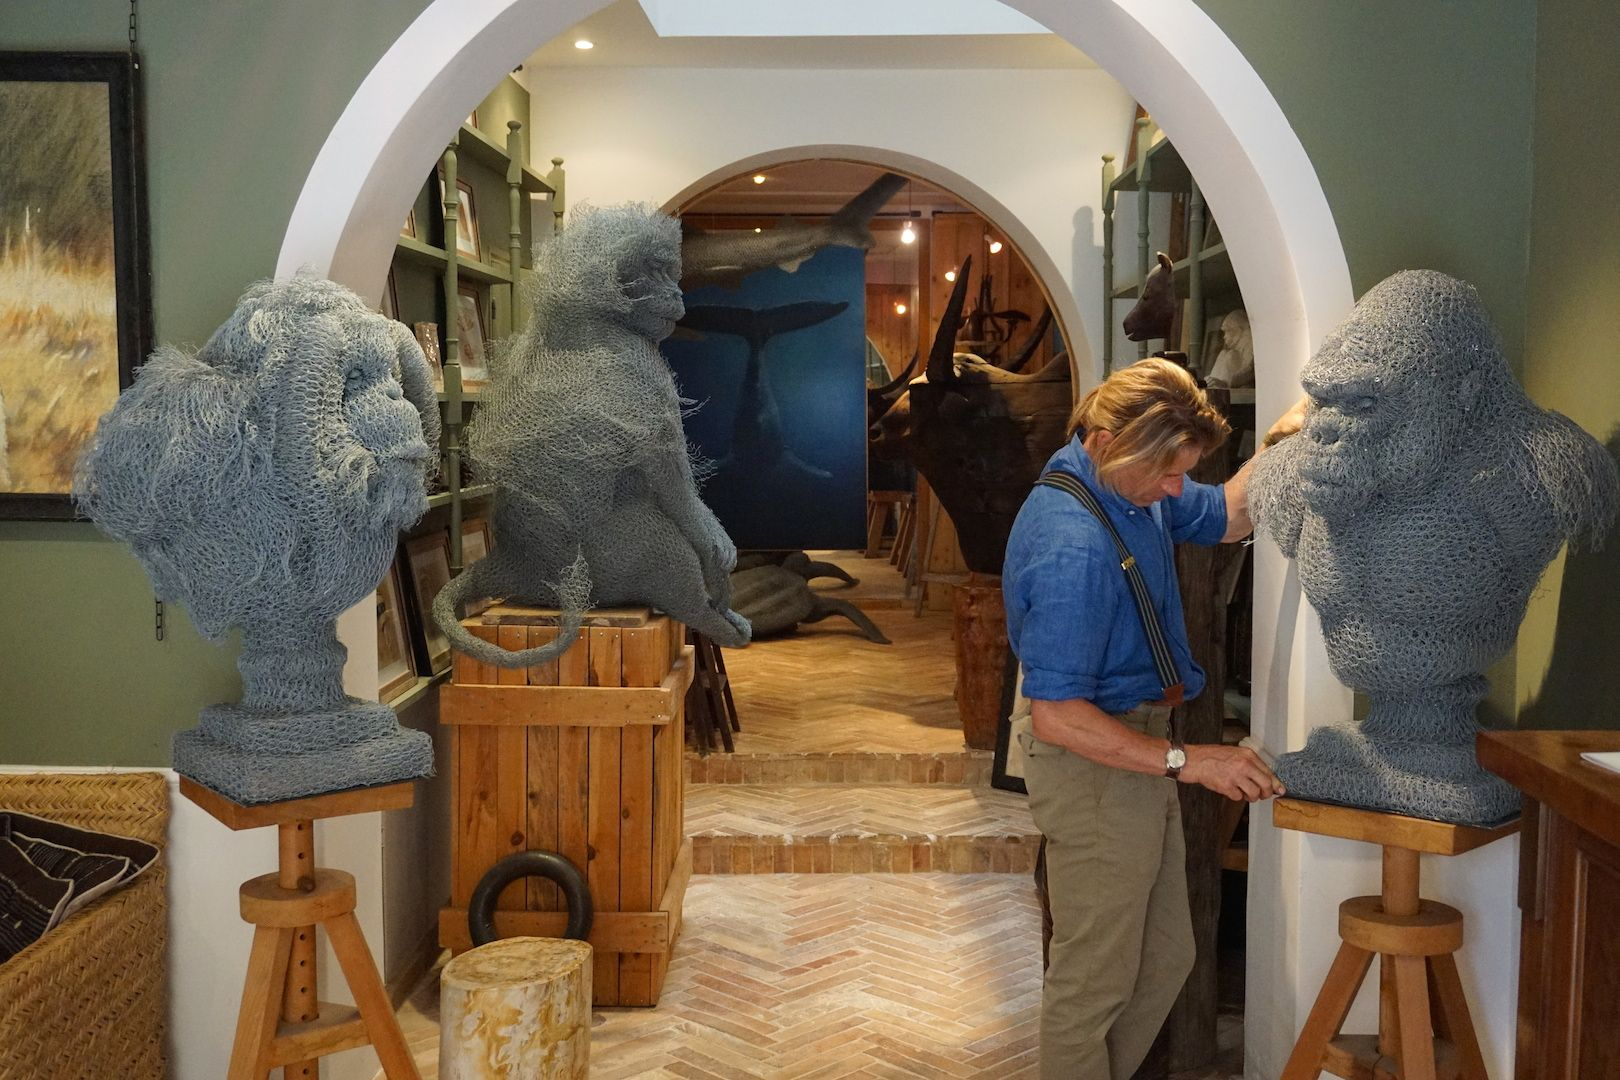 Galerie Wildlife Art, Gorille en grillage, sculptures en grillage, Aurélien Raynaud, peintre sculpteur animalier